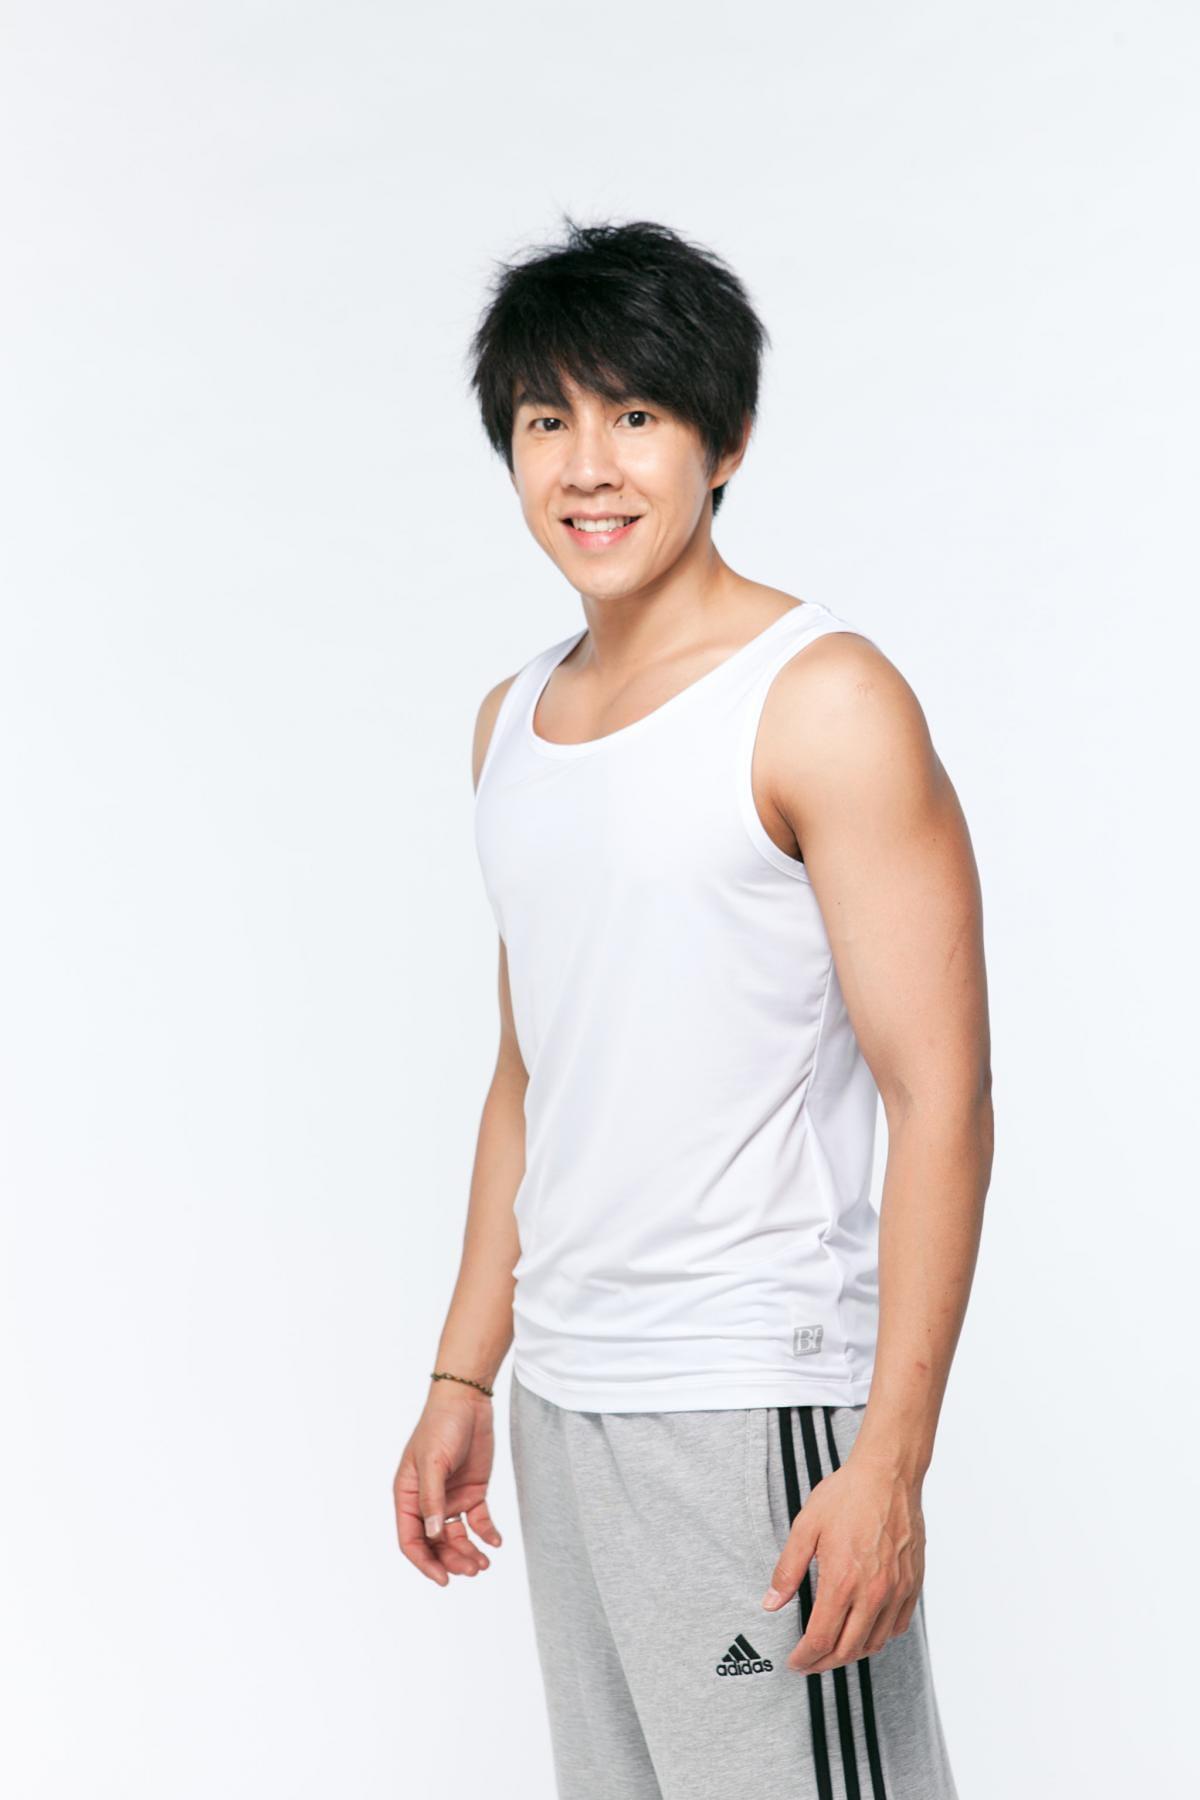 【BODYFEEL】体感服飾-夏季男款涼感抗UV坦克背心 2